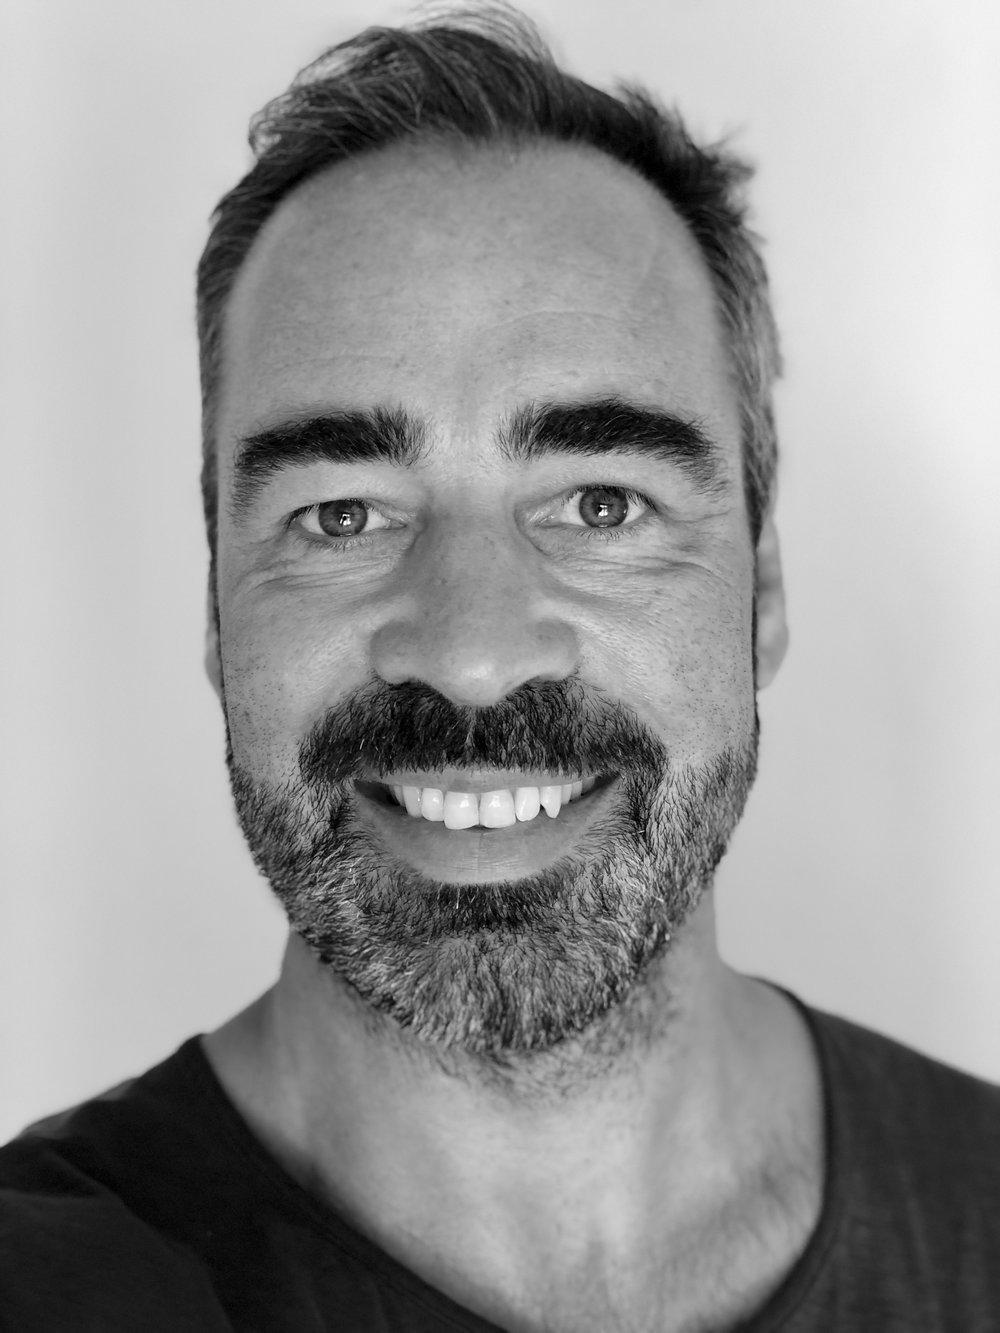 Portræt-sh-2018.jpg